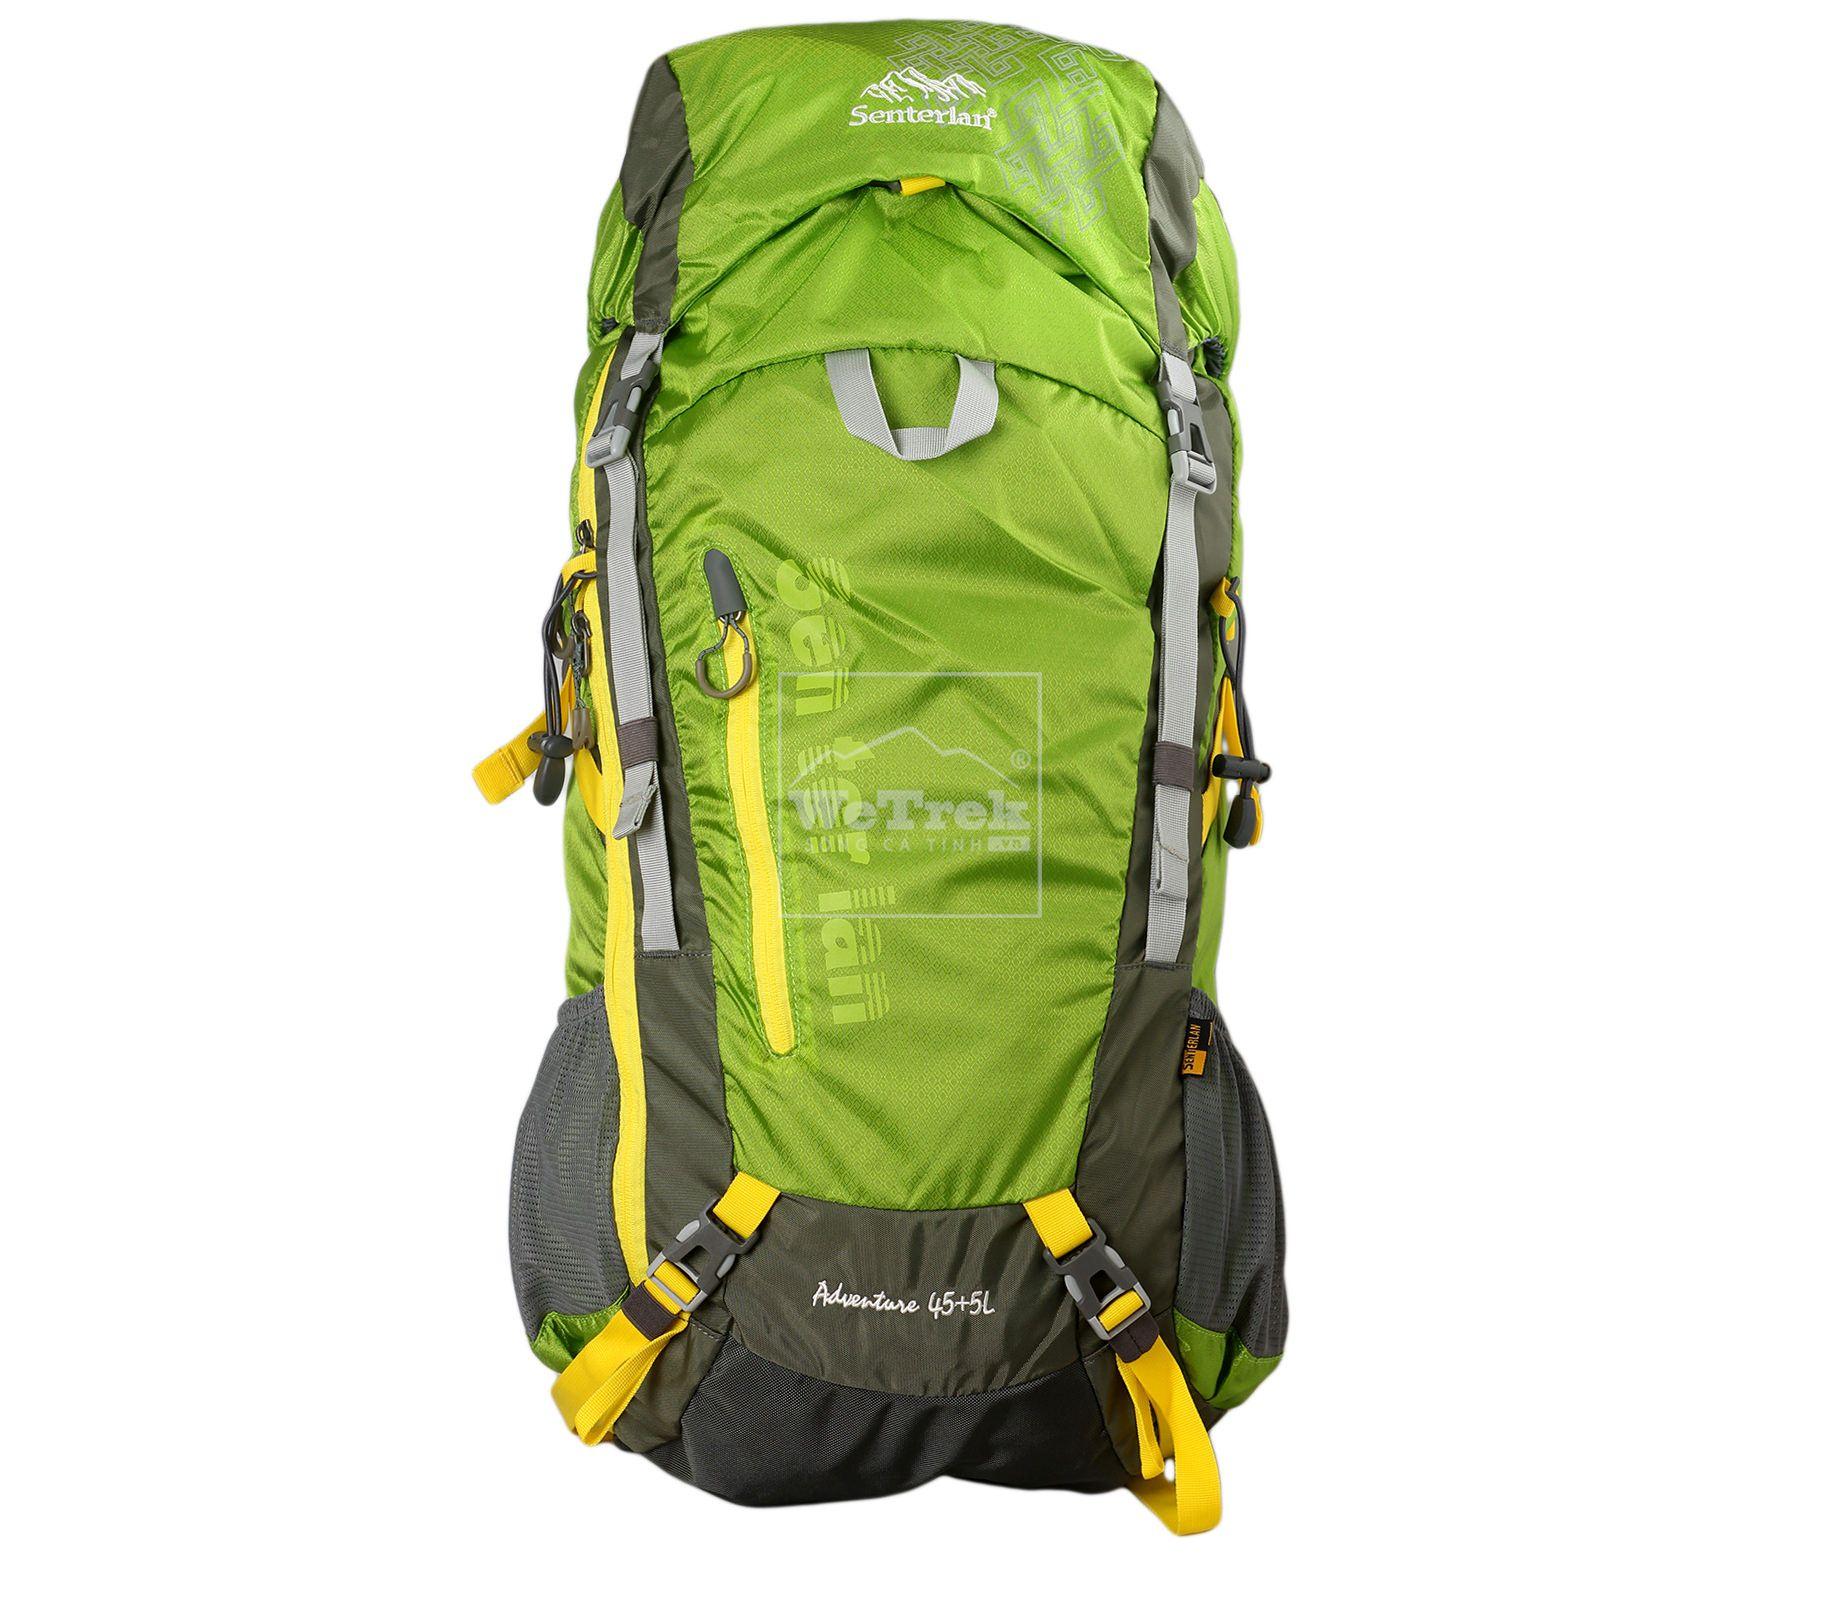 Balo leo núi Senterlan Adventure 45+5L S2375 Green - 5690